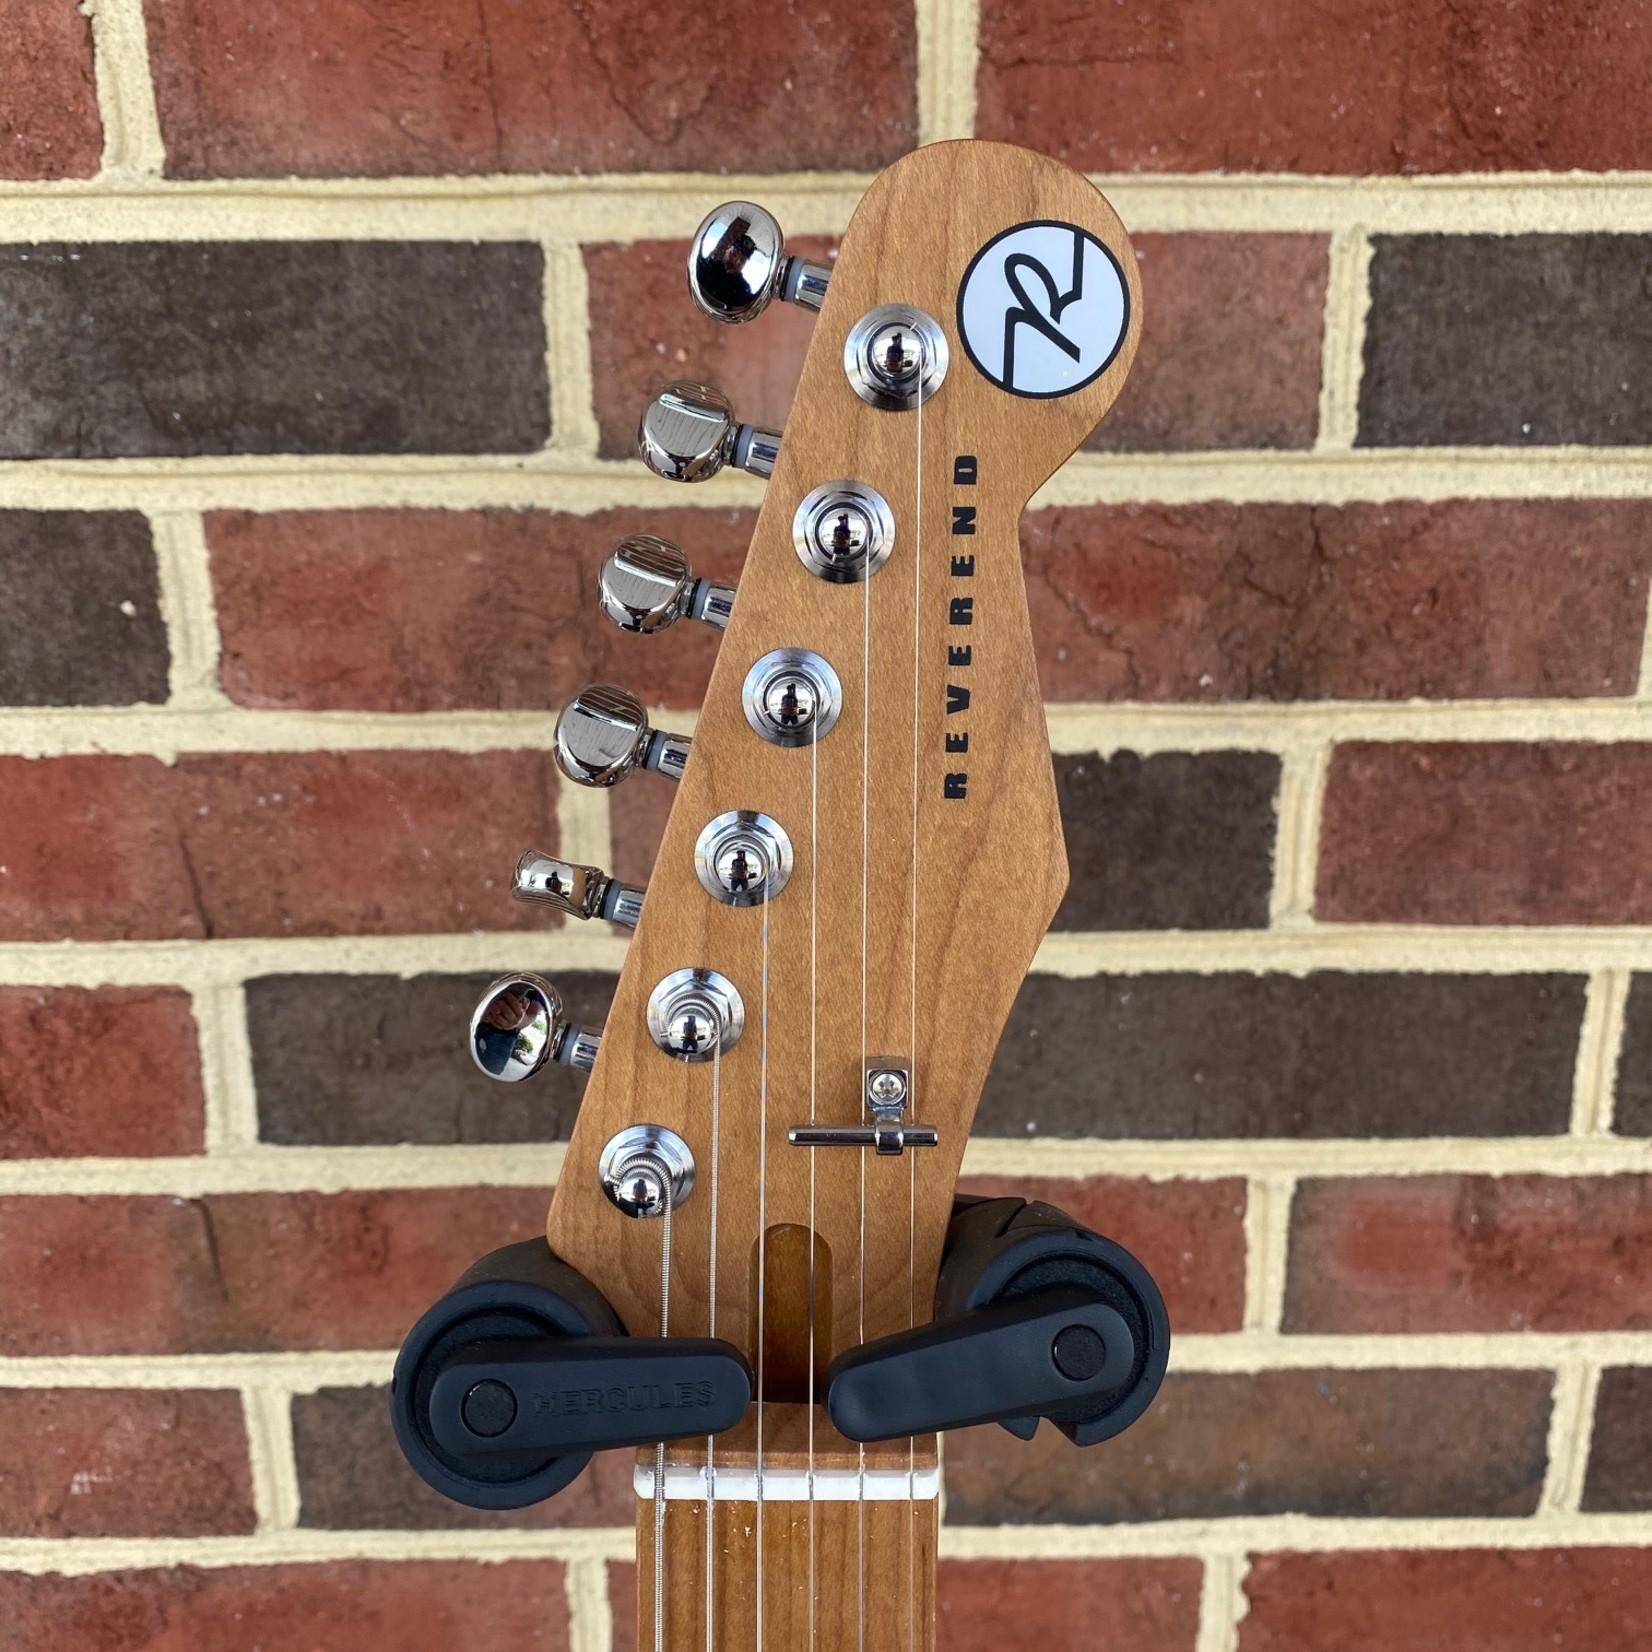 Reverend Reverend Guitars Greg Koch Gristlemaster, Blucifer, Fishman Fluence Signature Pickups, Roasted Maple Neck and Fretboard